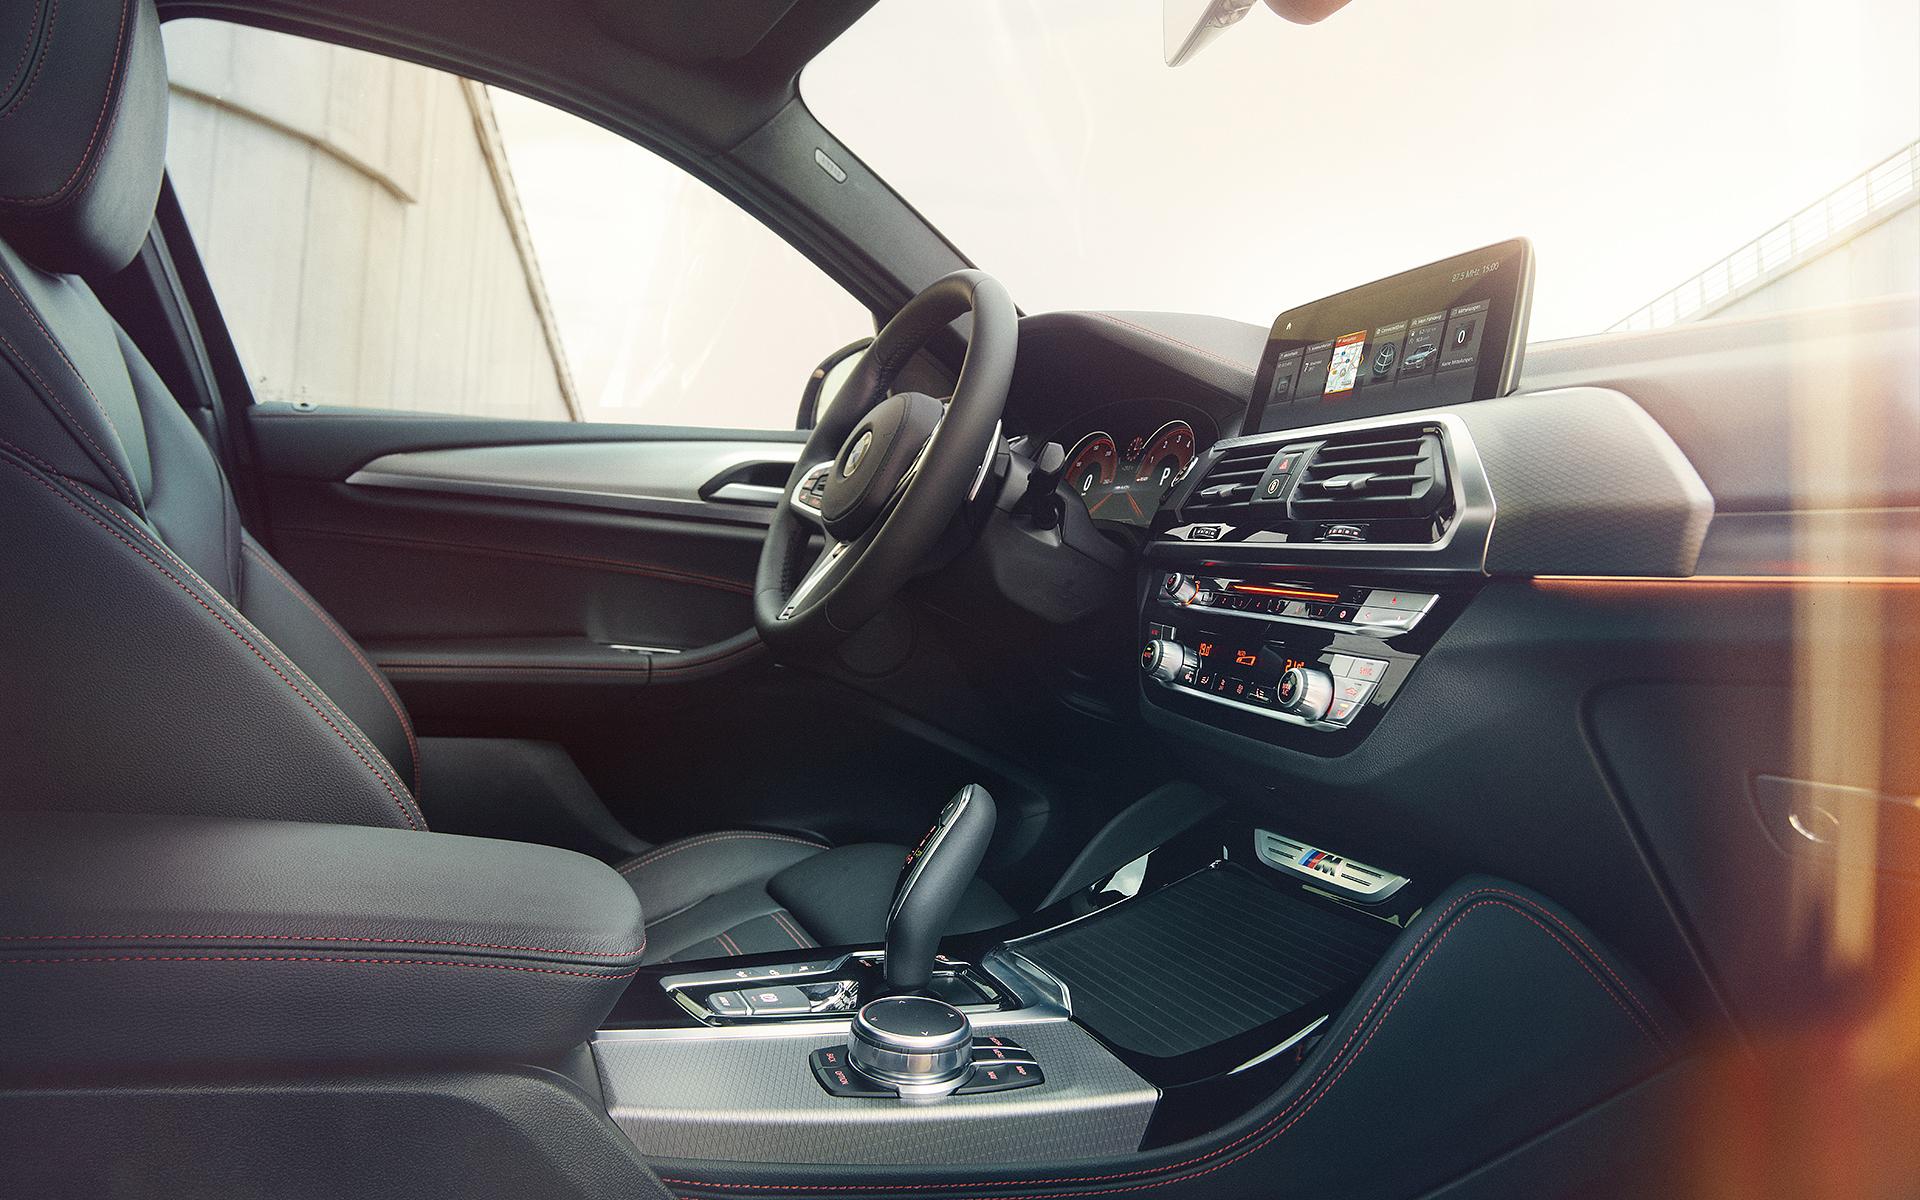 BMW X4 2019 interior